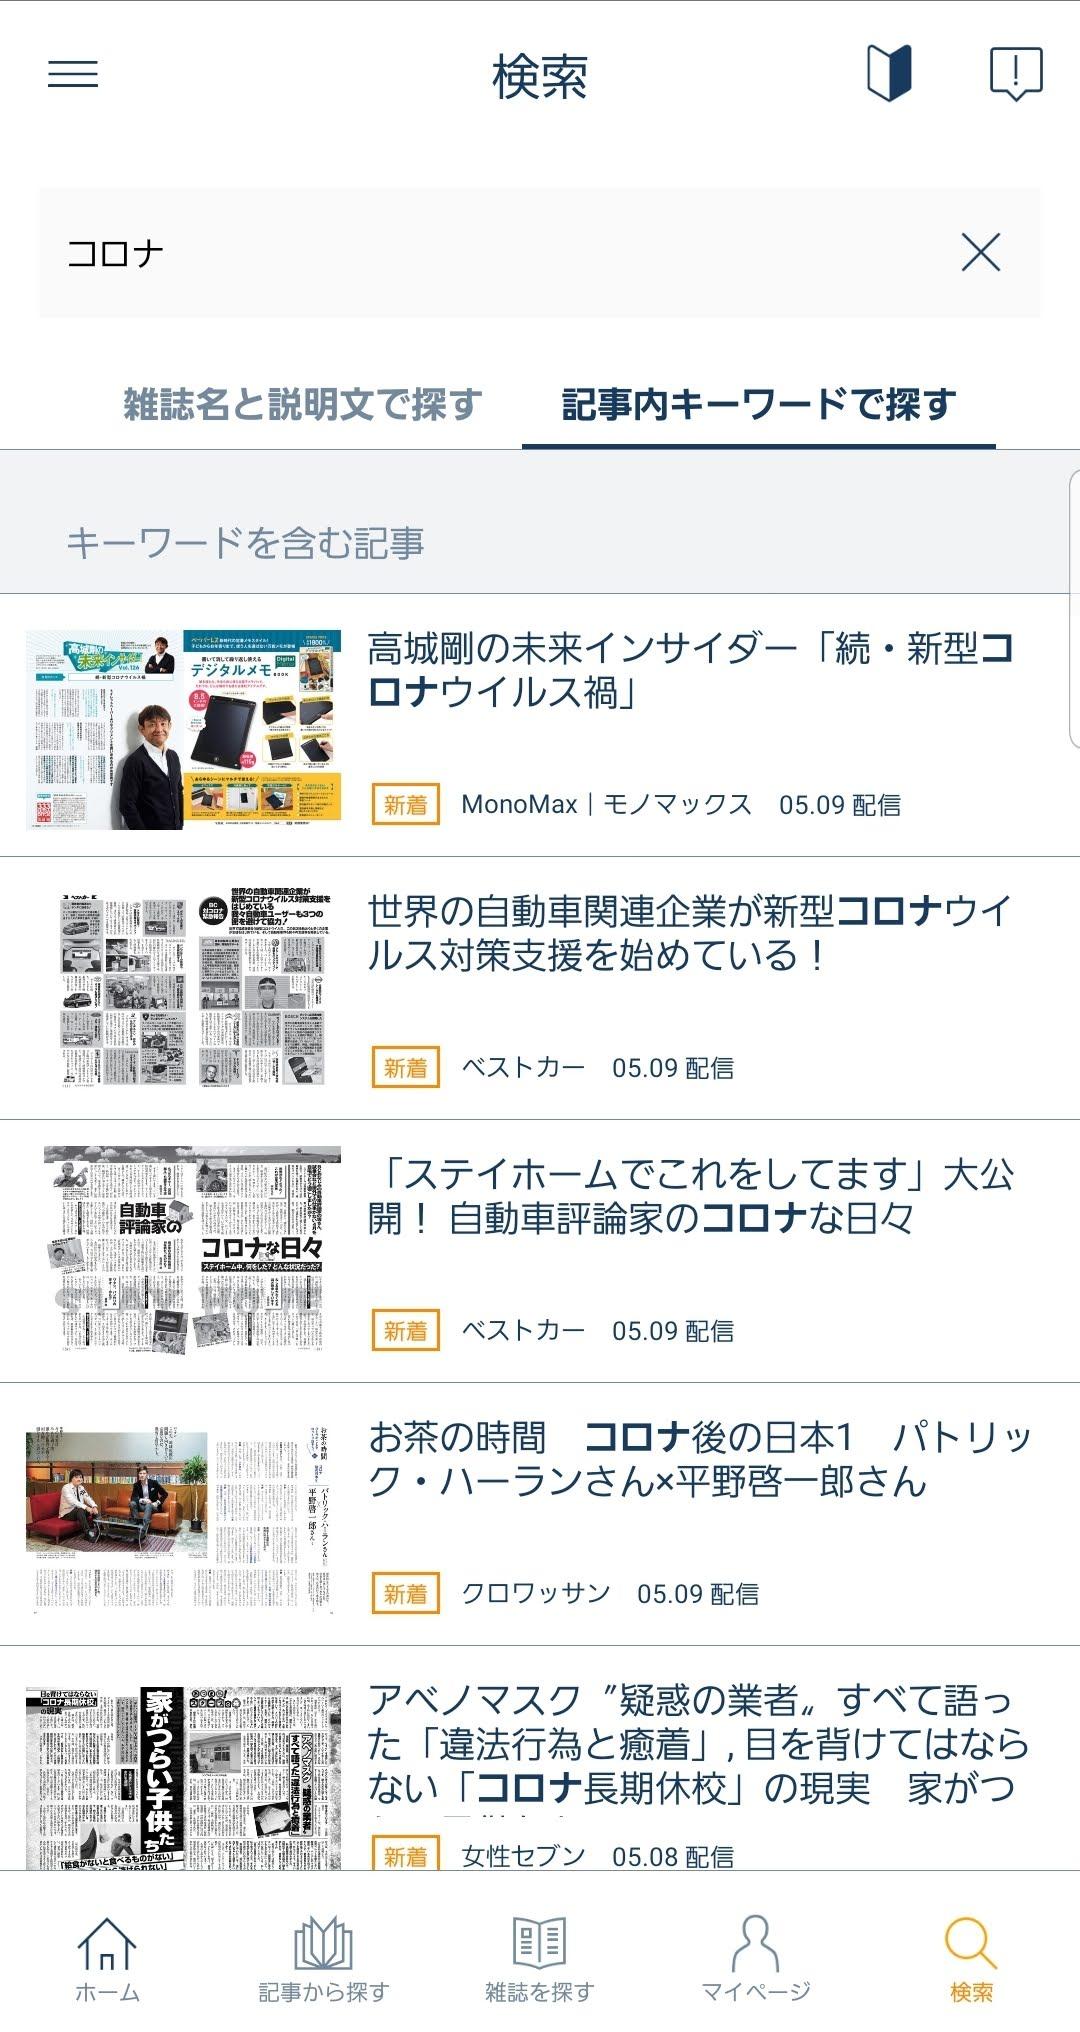 RMagazine search